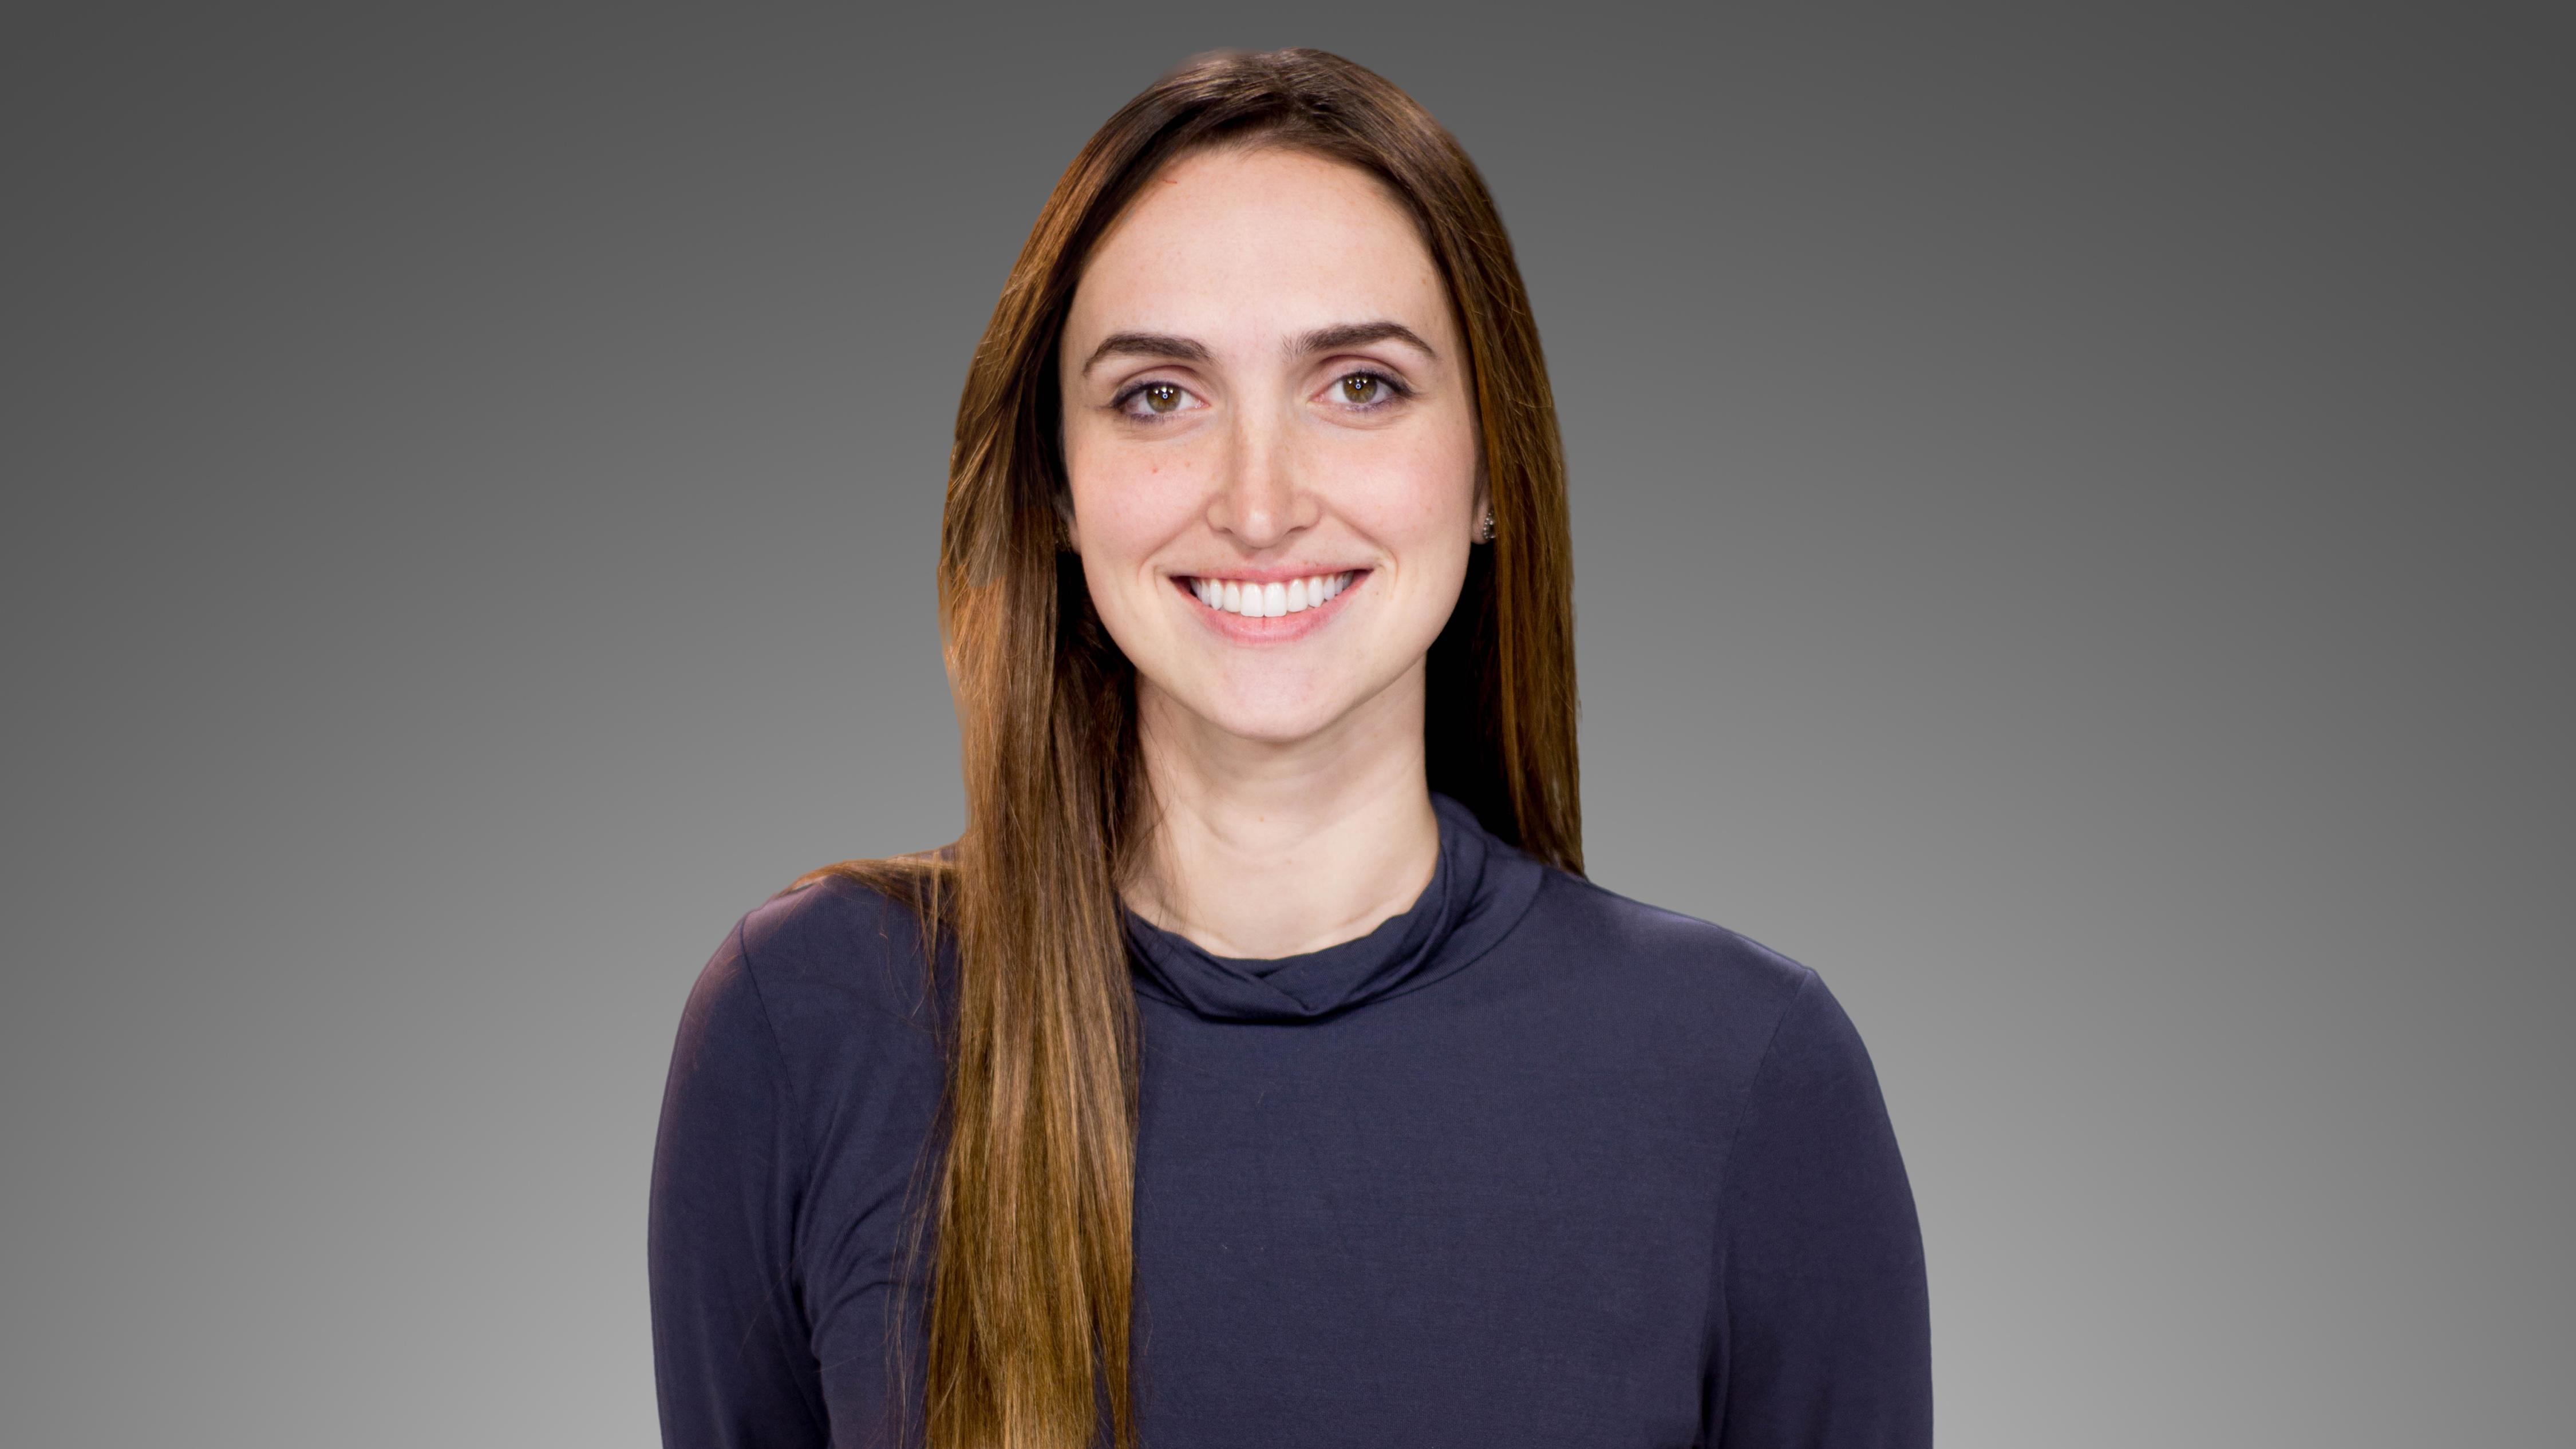 Madison Stacey, Digital Storyteller